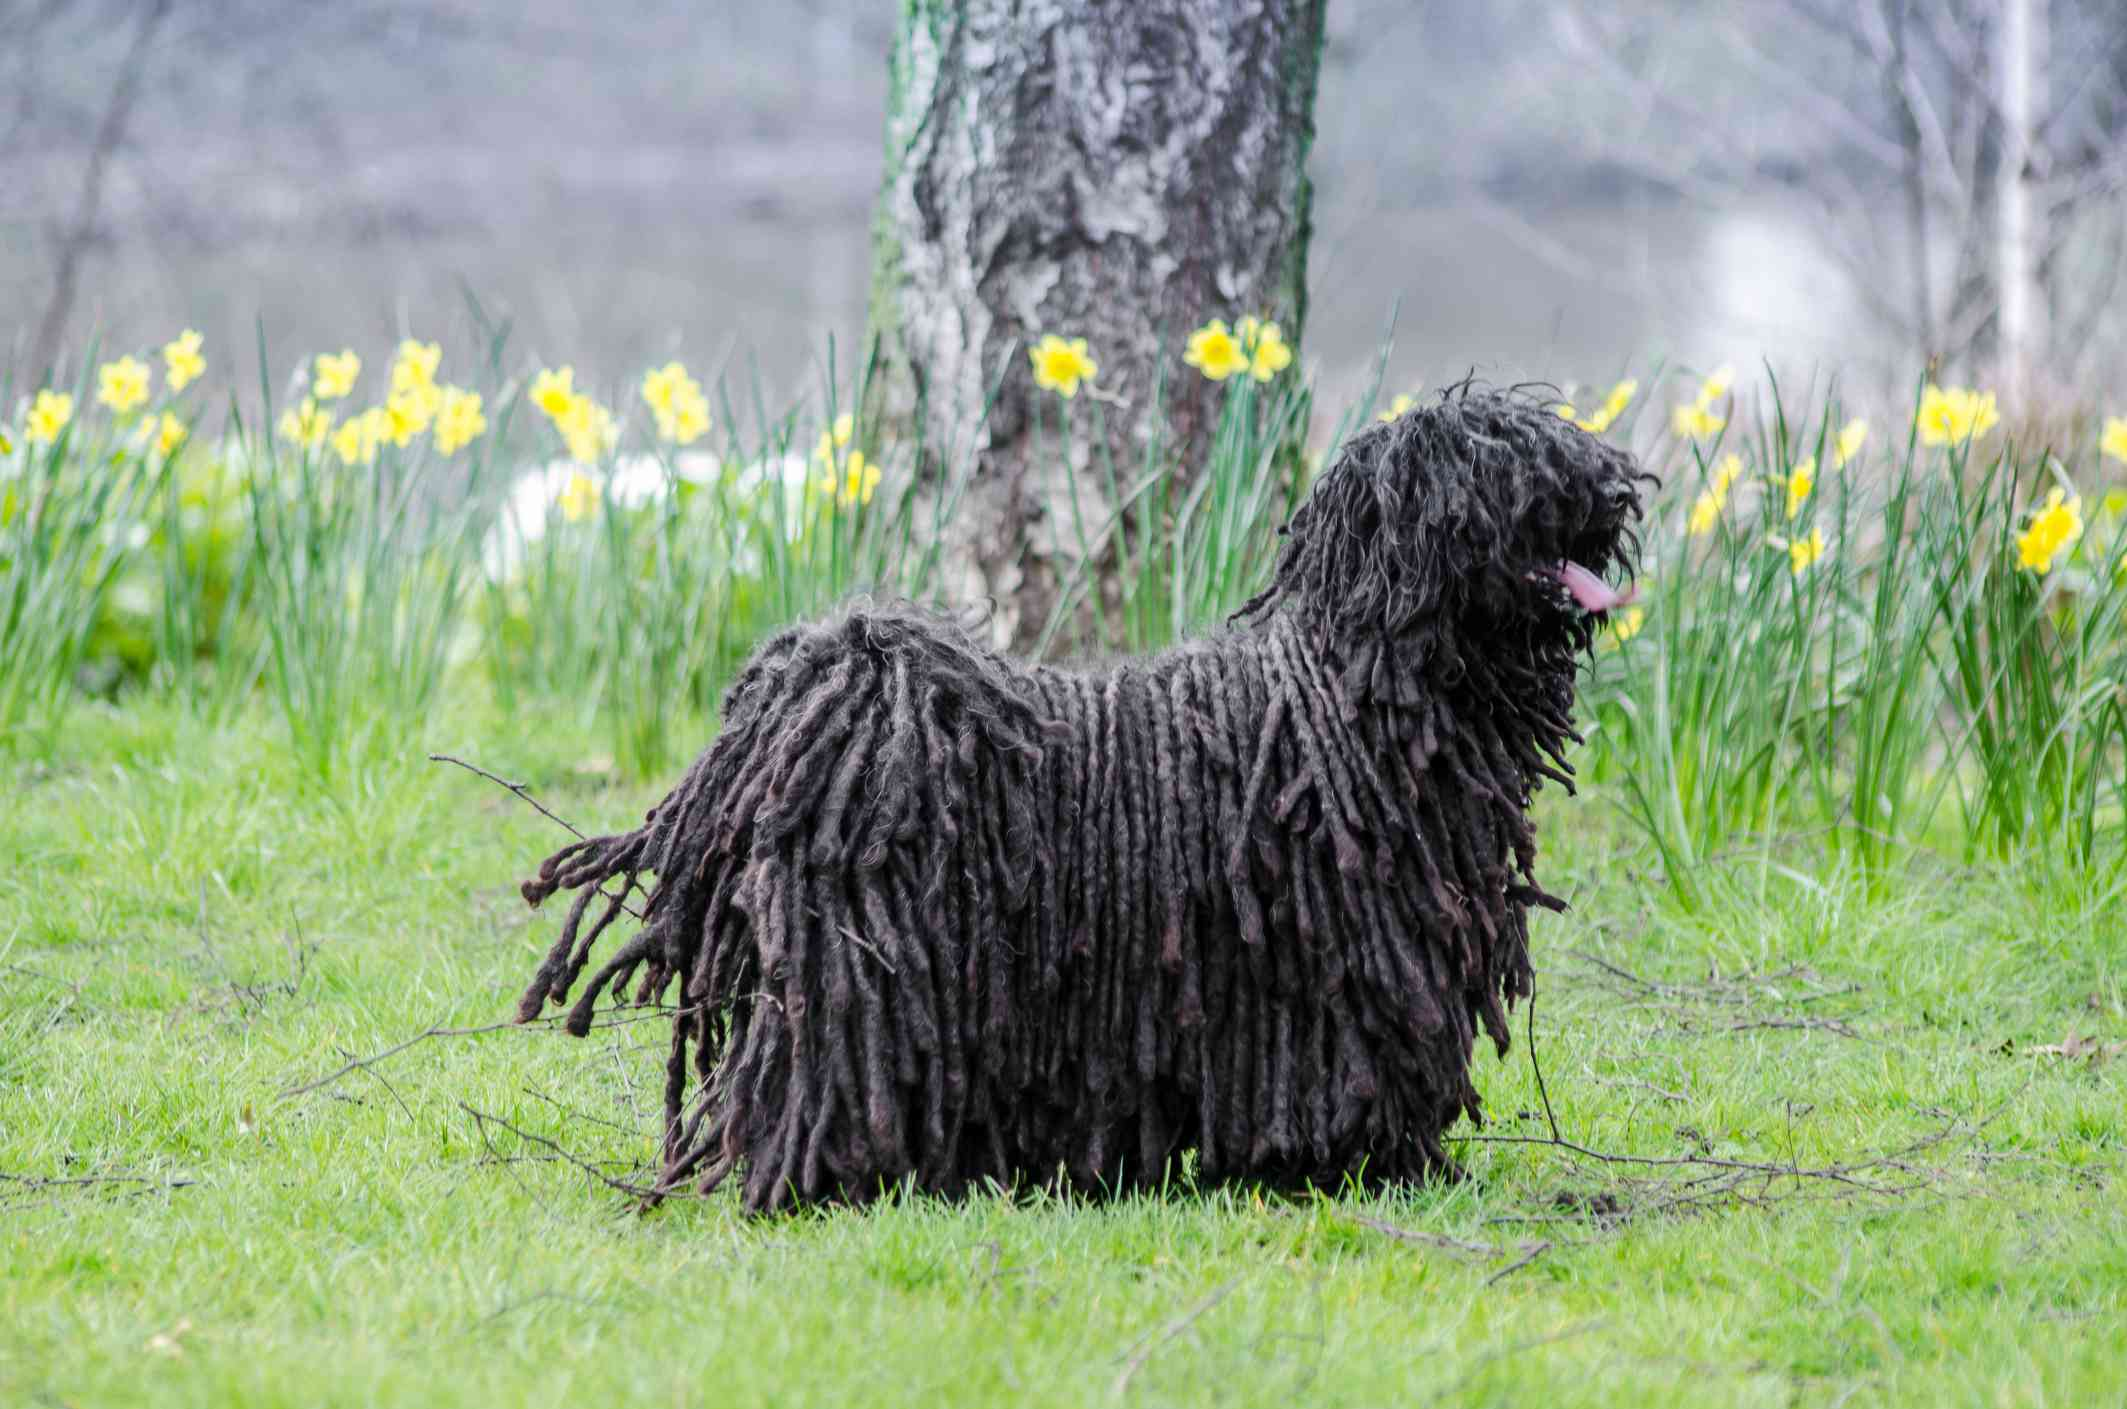 Puli Standing On Grassy Field